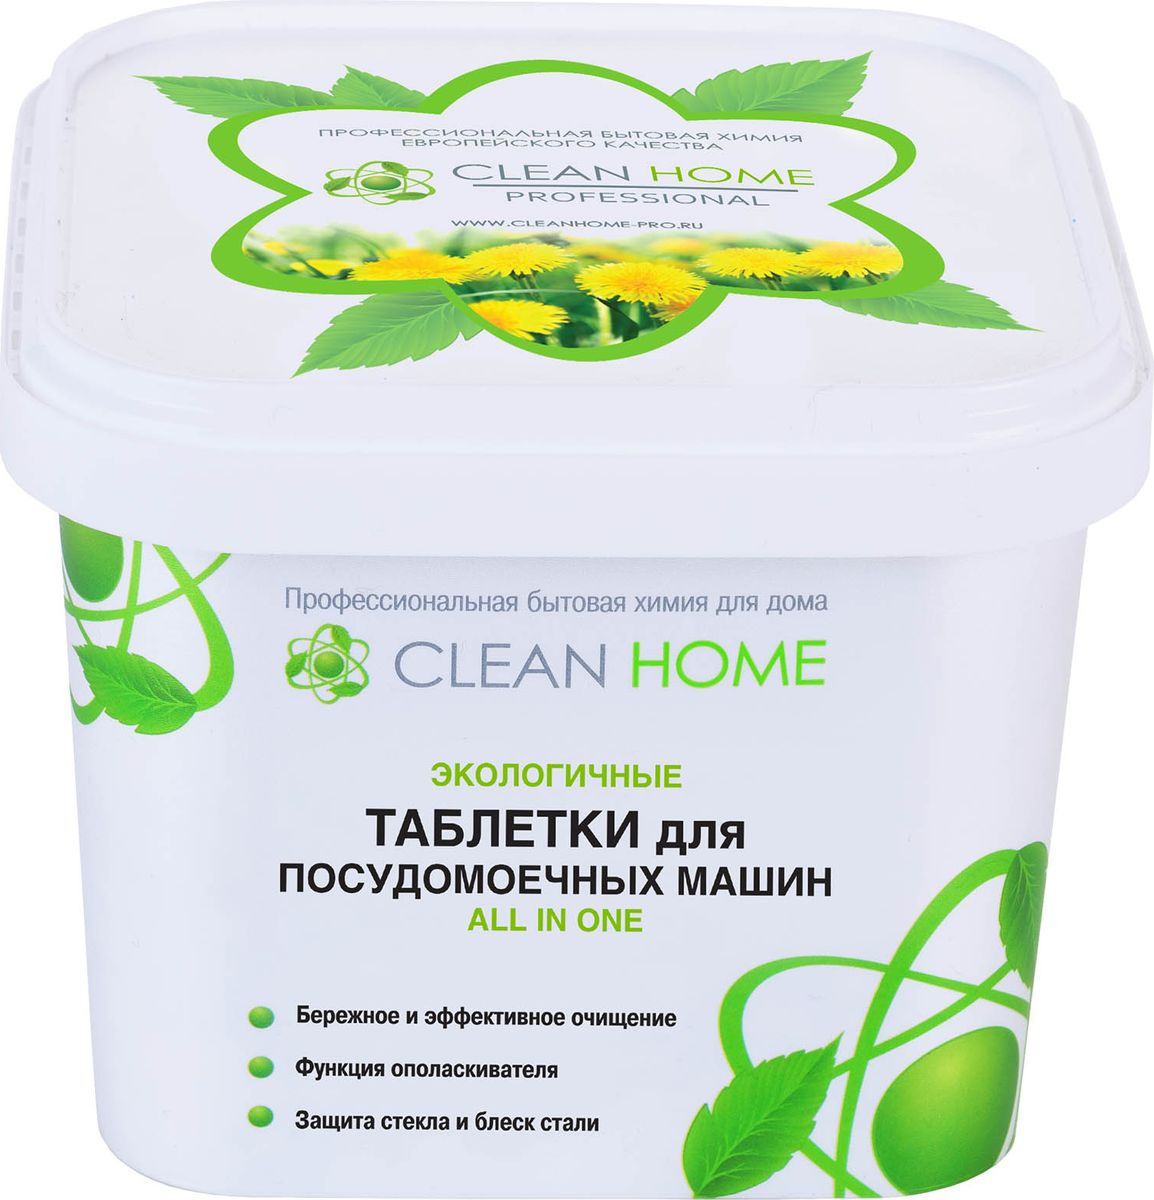 Таблетки для мытья посуды Clean Home All in One, для посудомоечных машин, 30 шт таблетки для посудомоечных машин clean